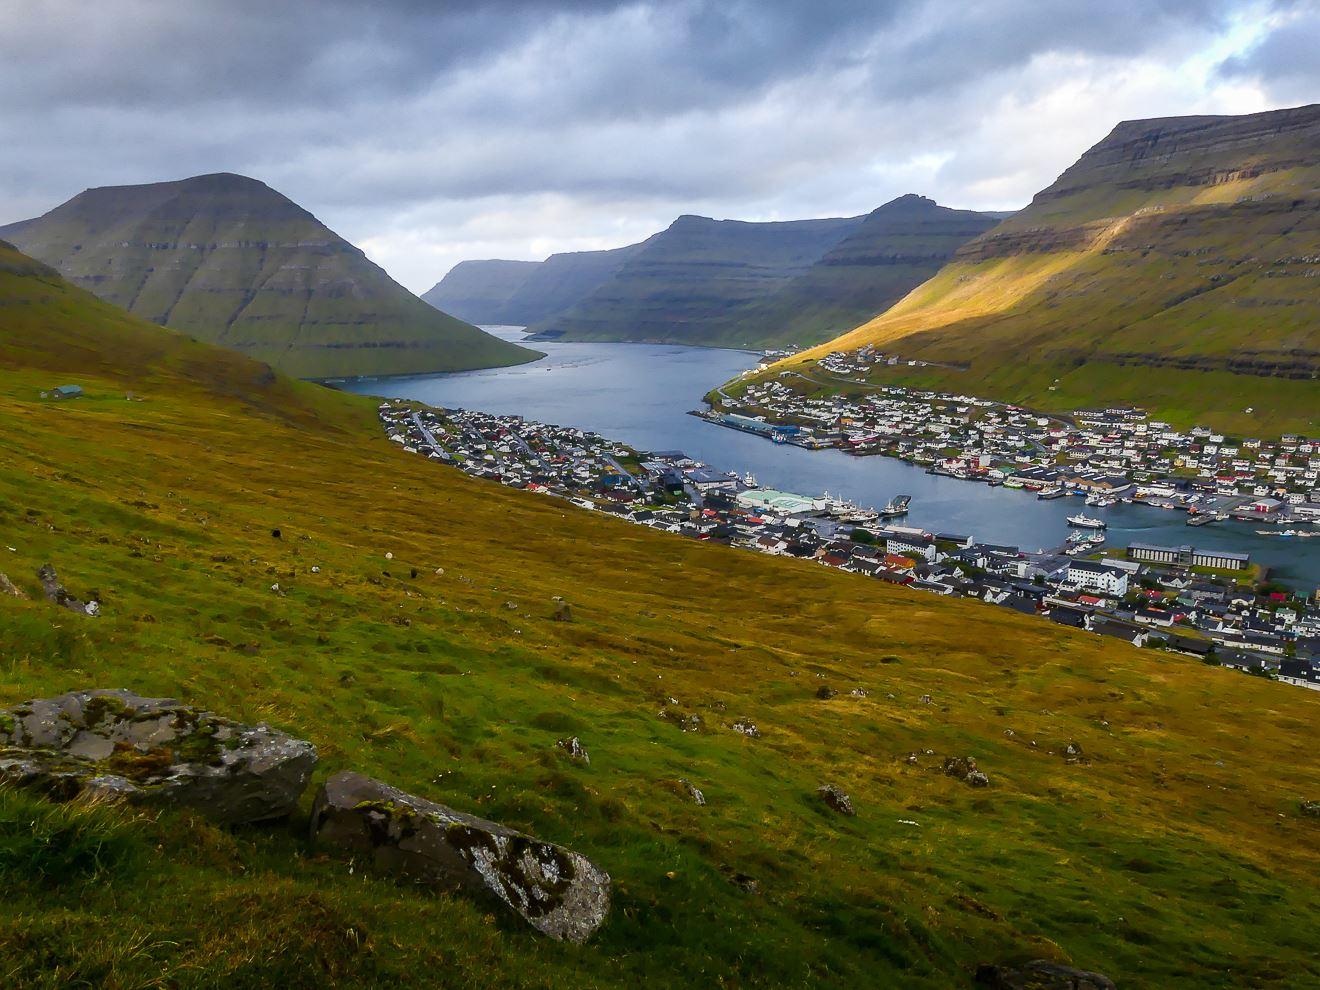 Iles Feroe : randonnée Hauteurs de Klaksvik